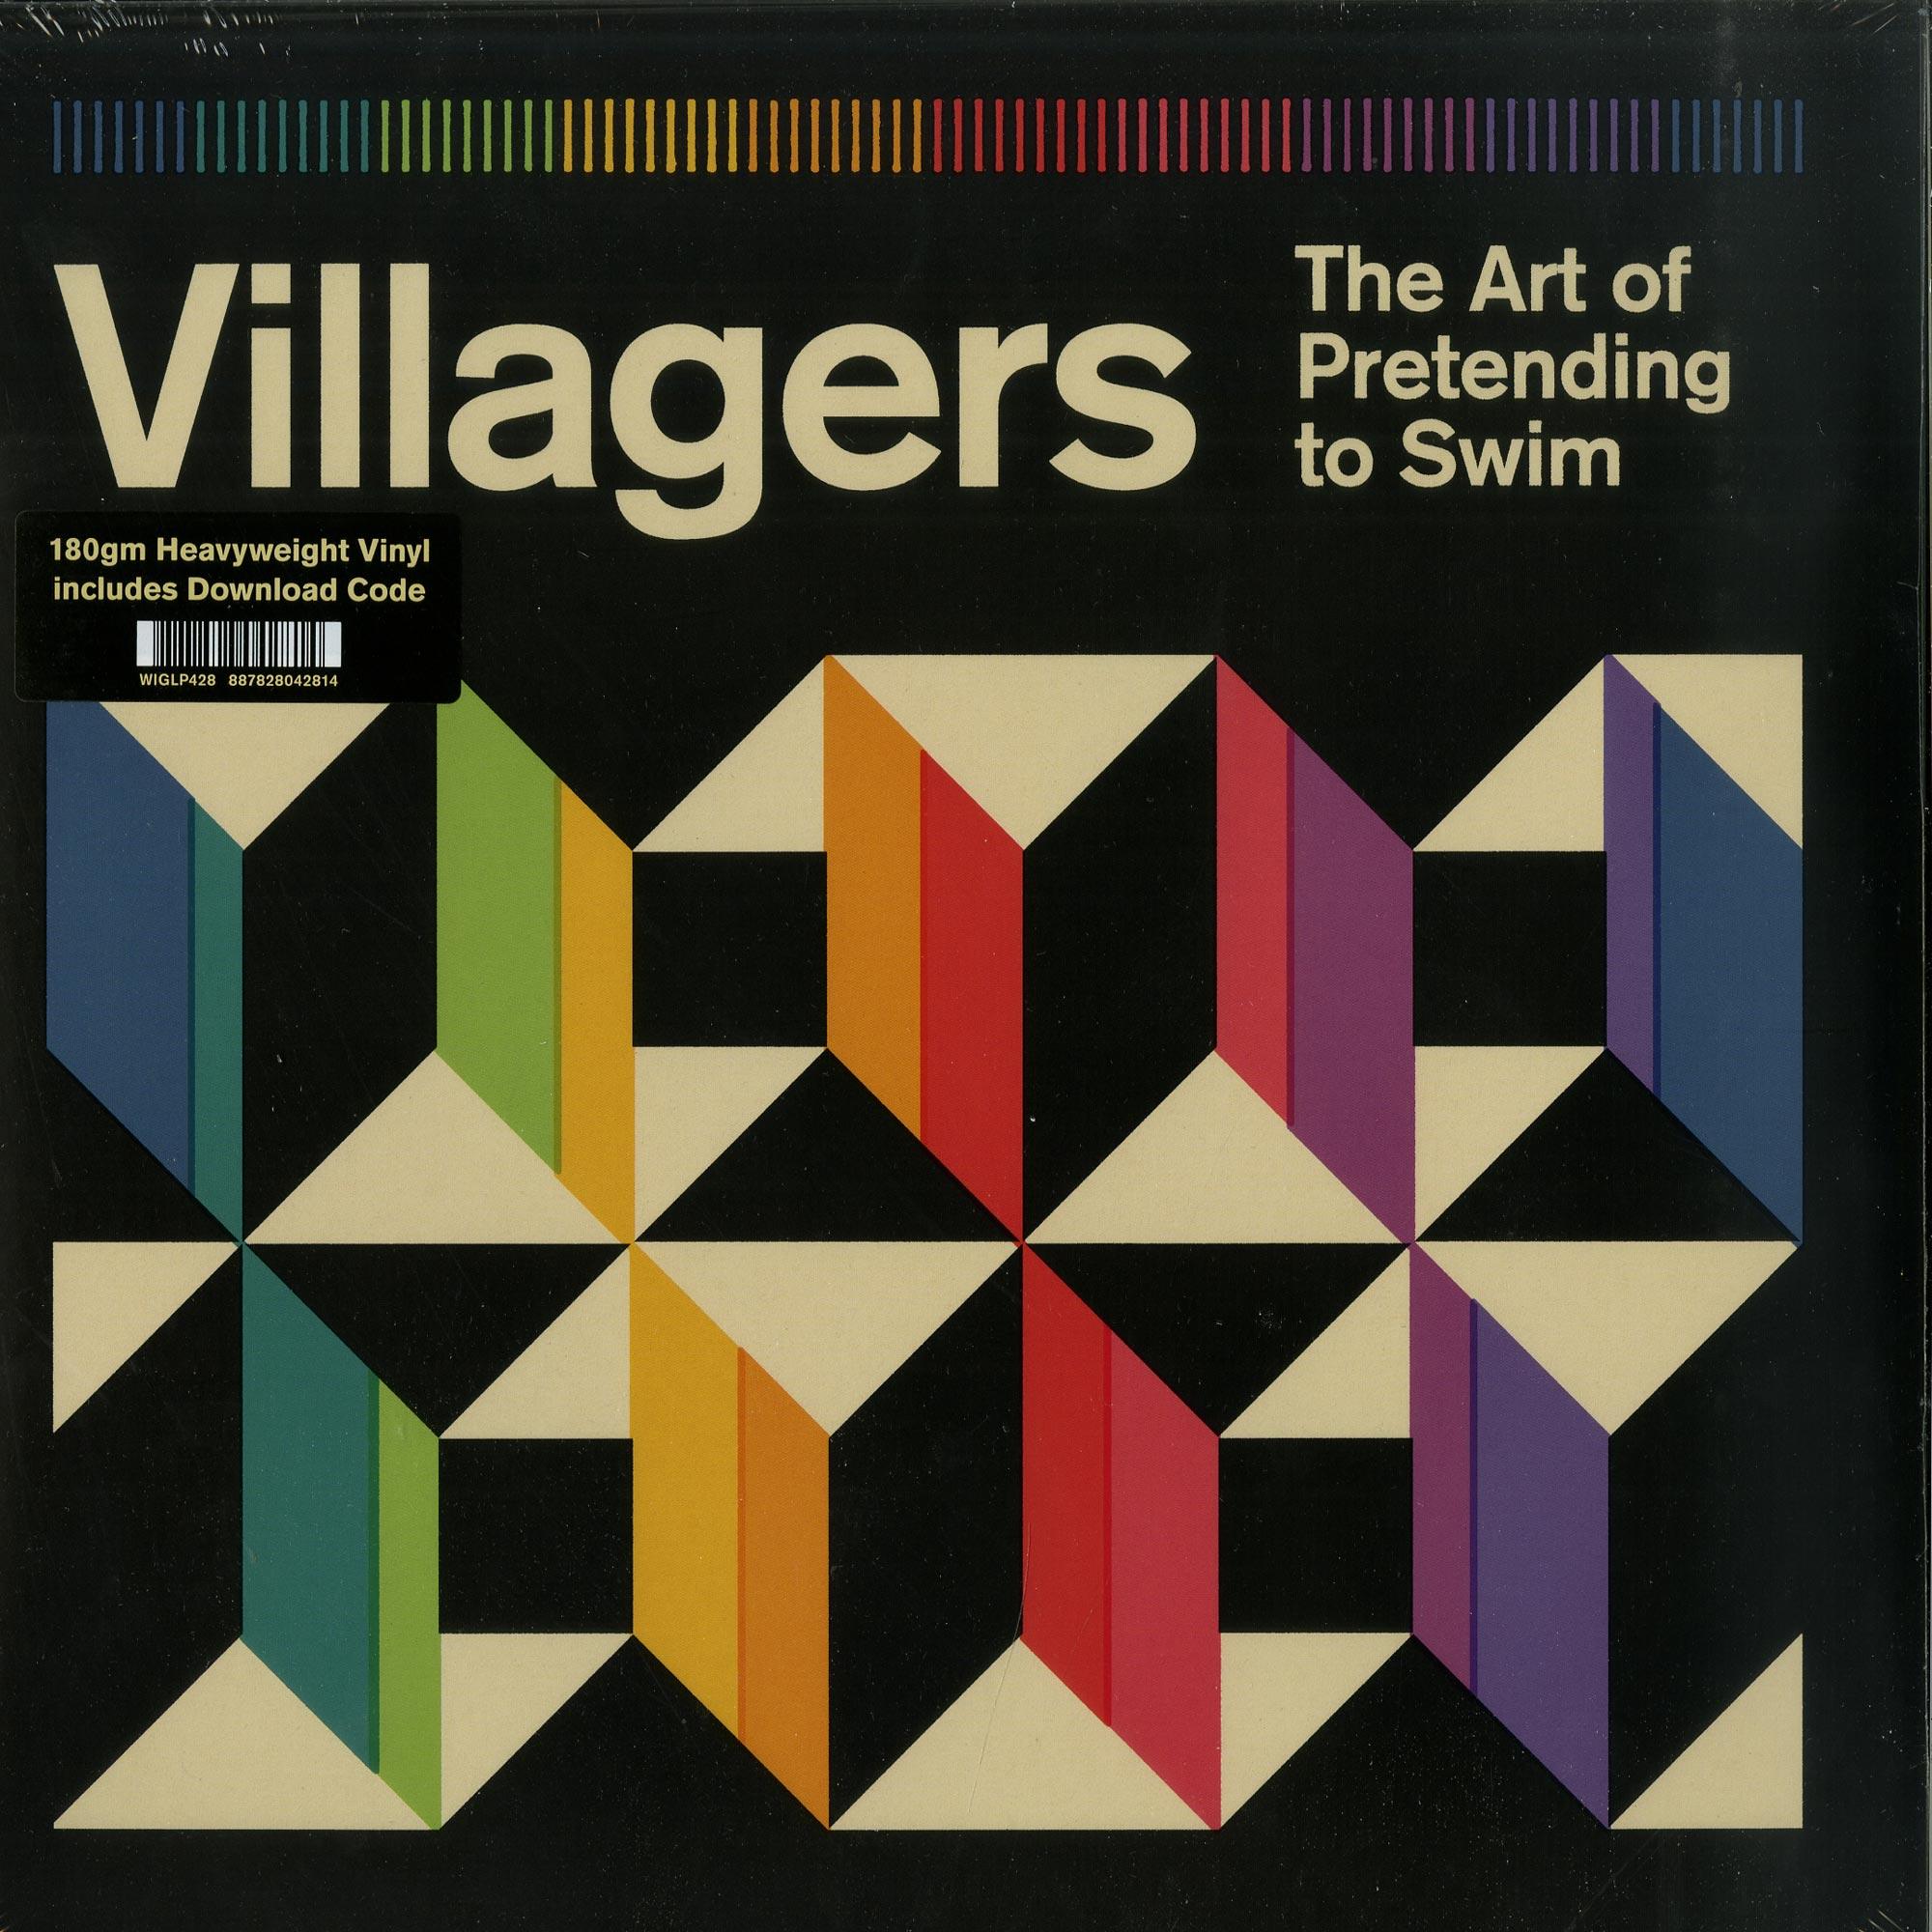 Villagers - THE ART OF PRETENDING TO SWIM